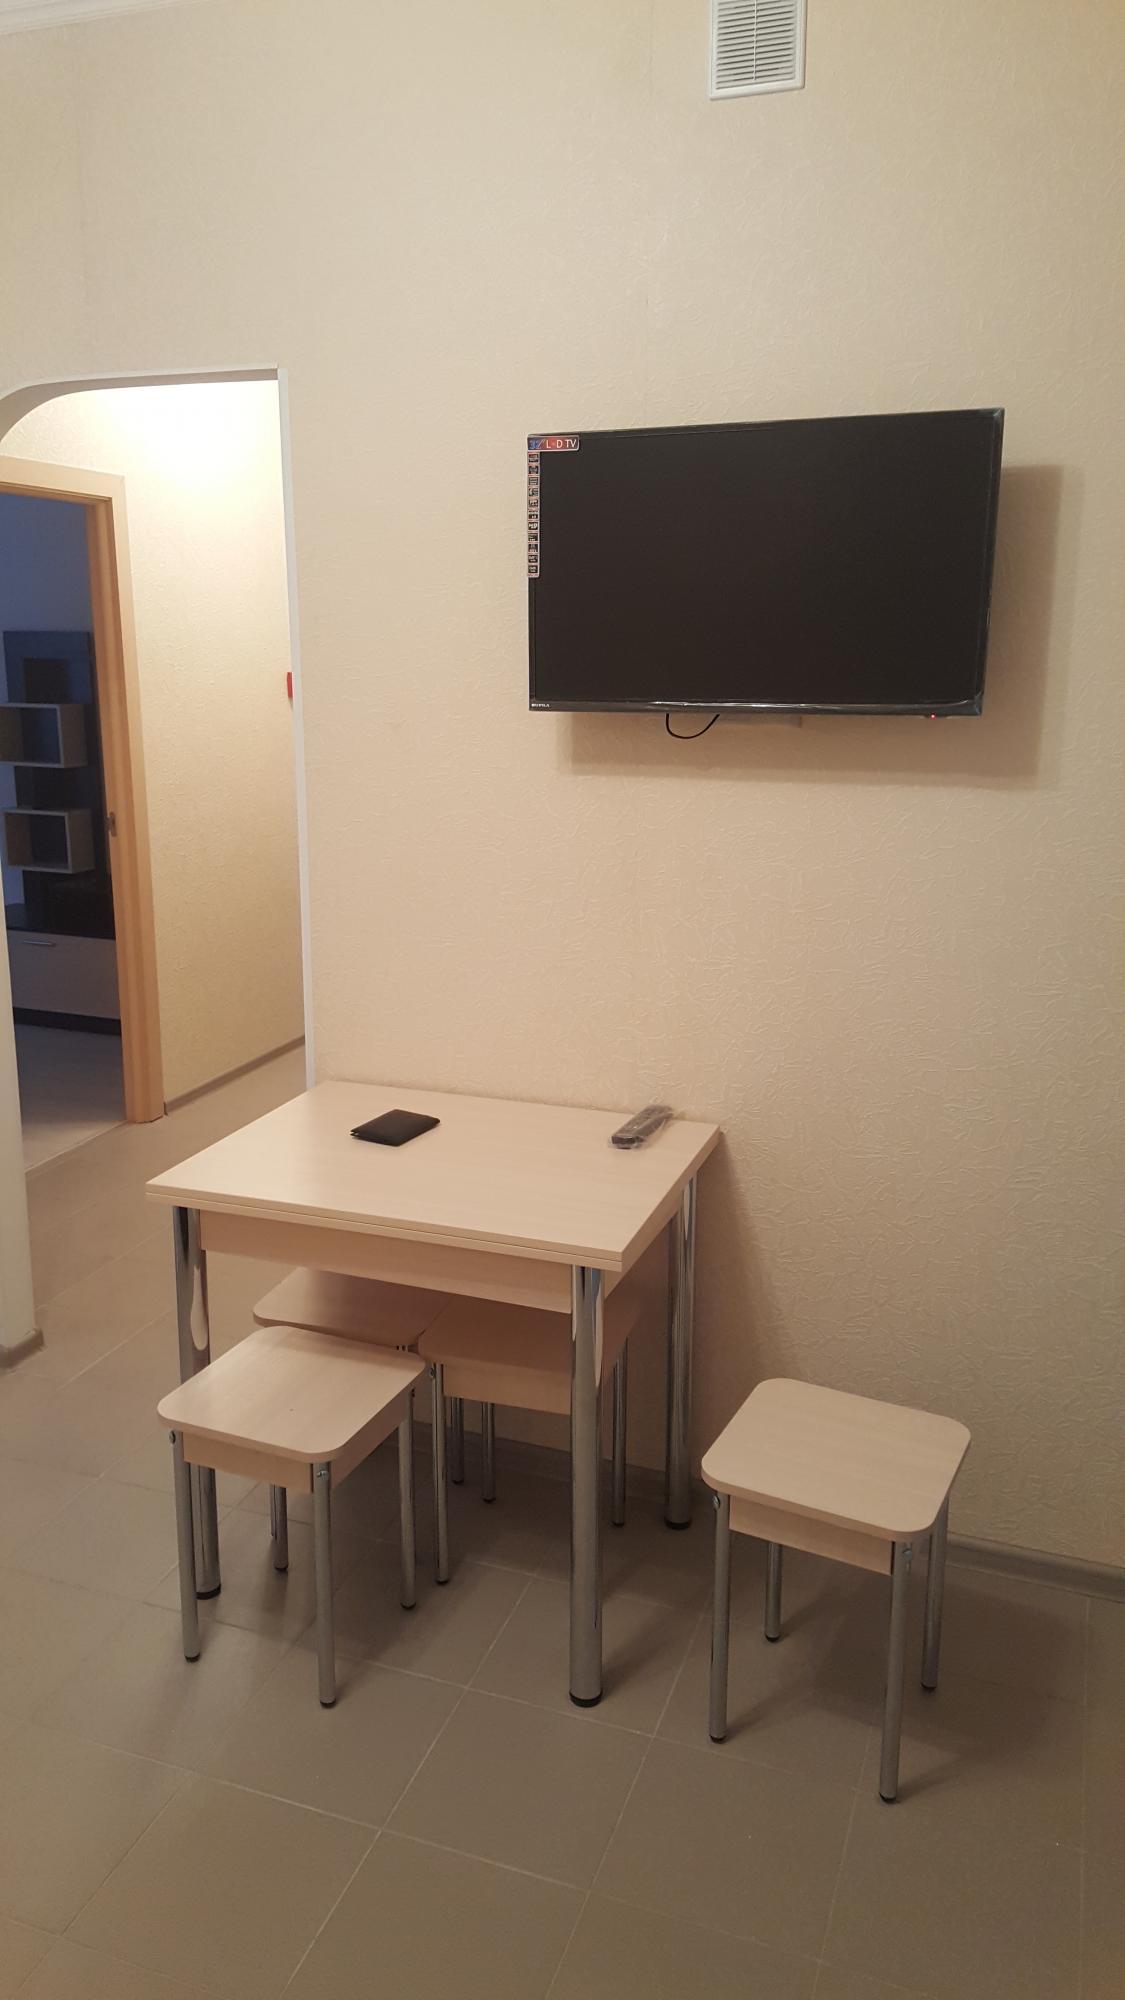 Квартира, 1 комната, 40 м² в Зеленограде 89776541696 купить 8